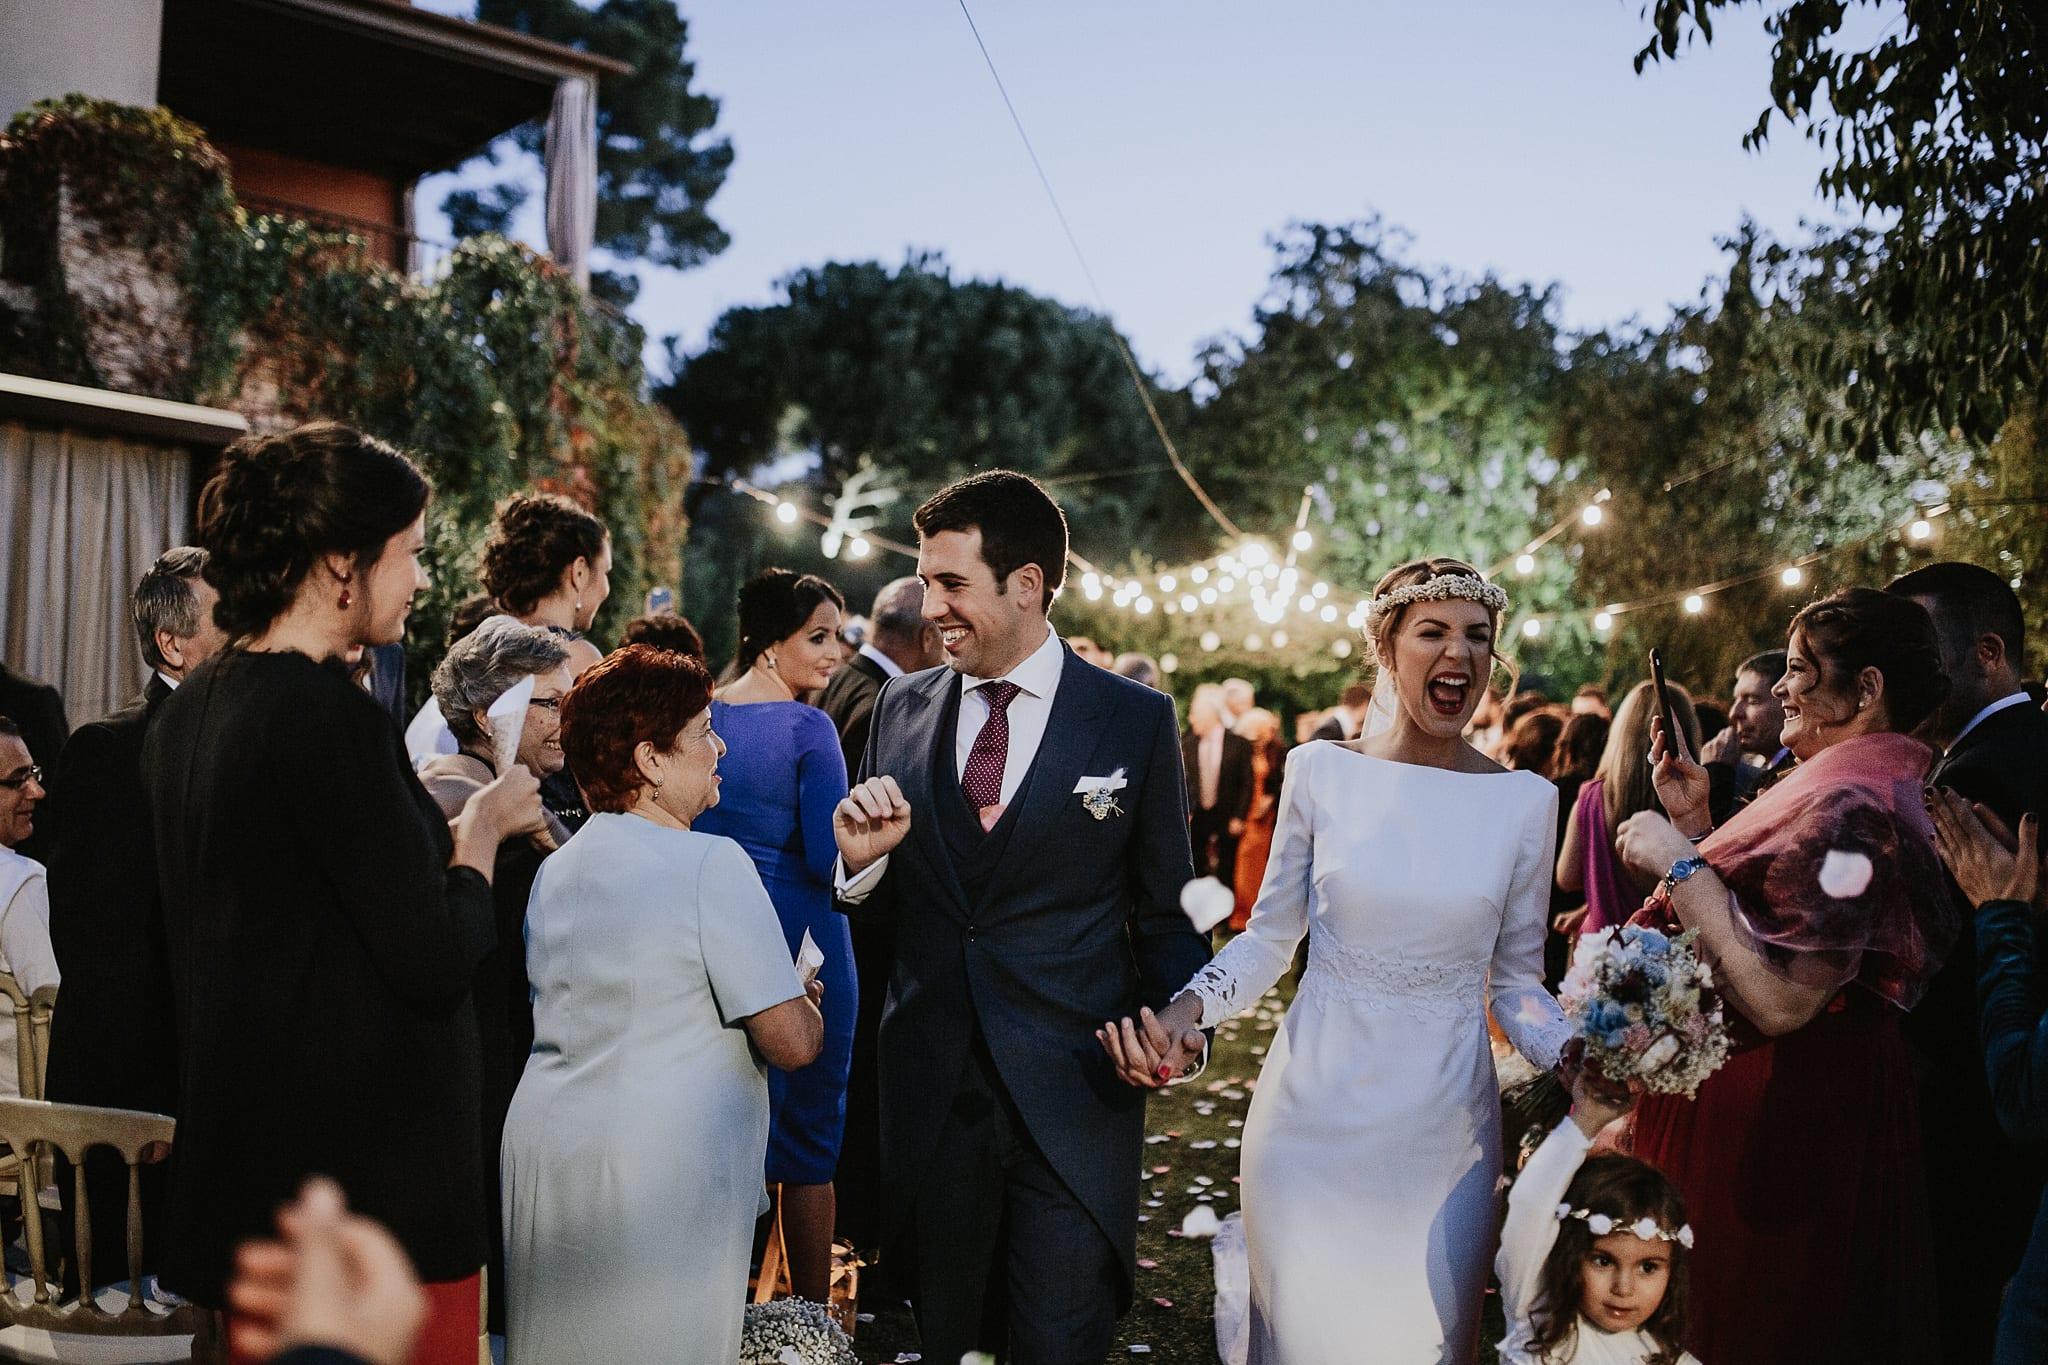 prisma-blanco-fotografos-bodas-toledo-136